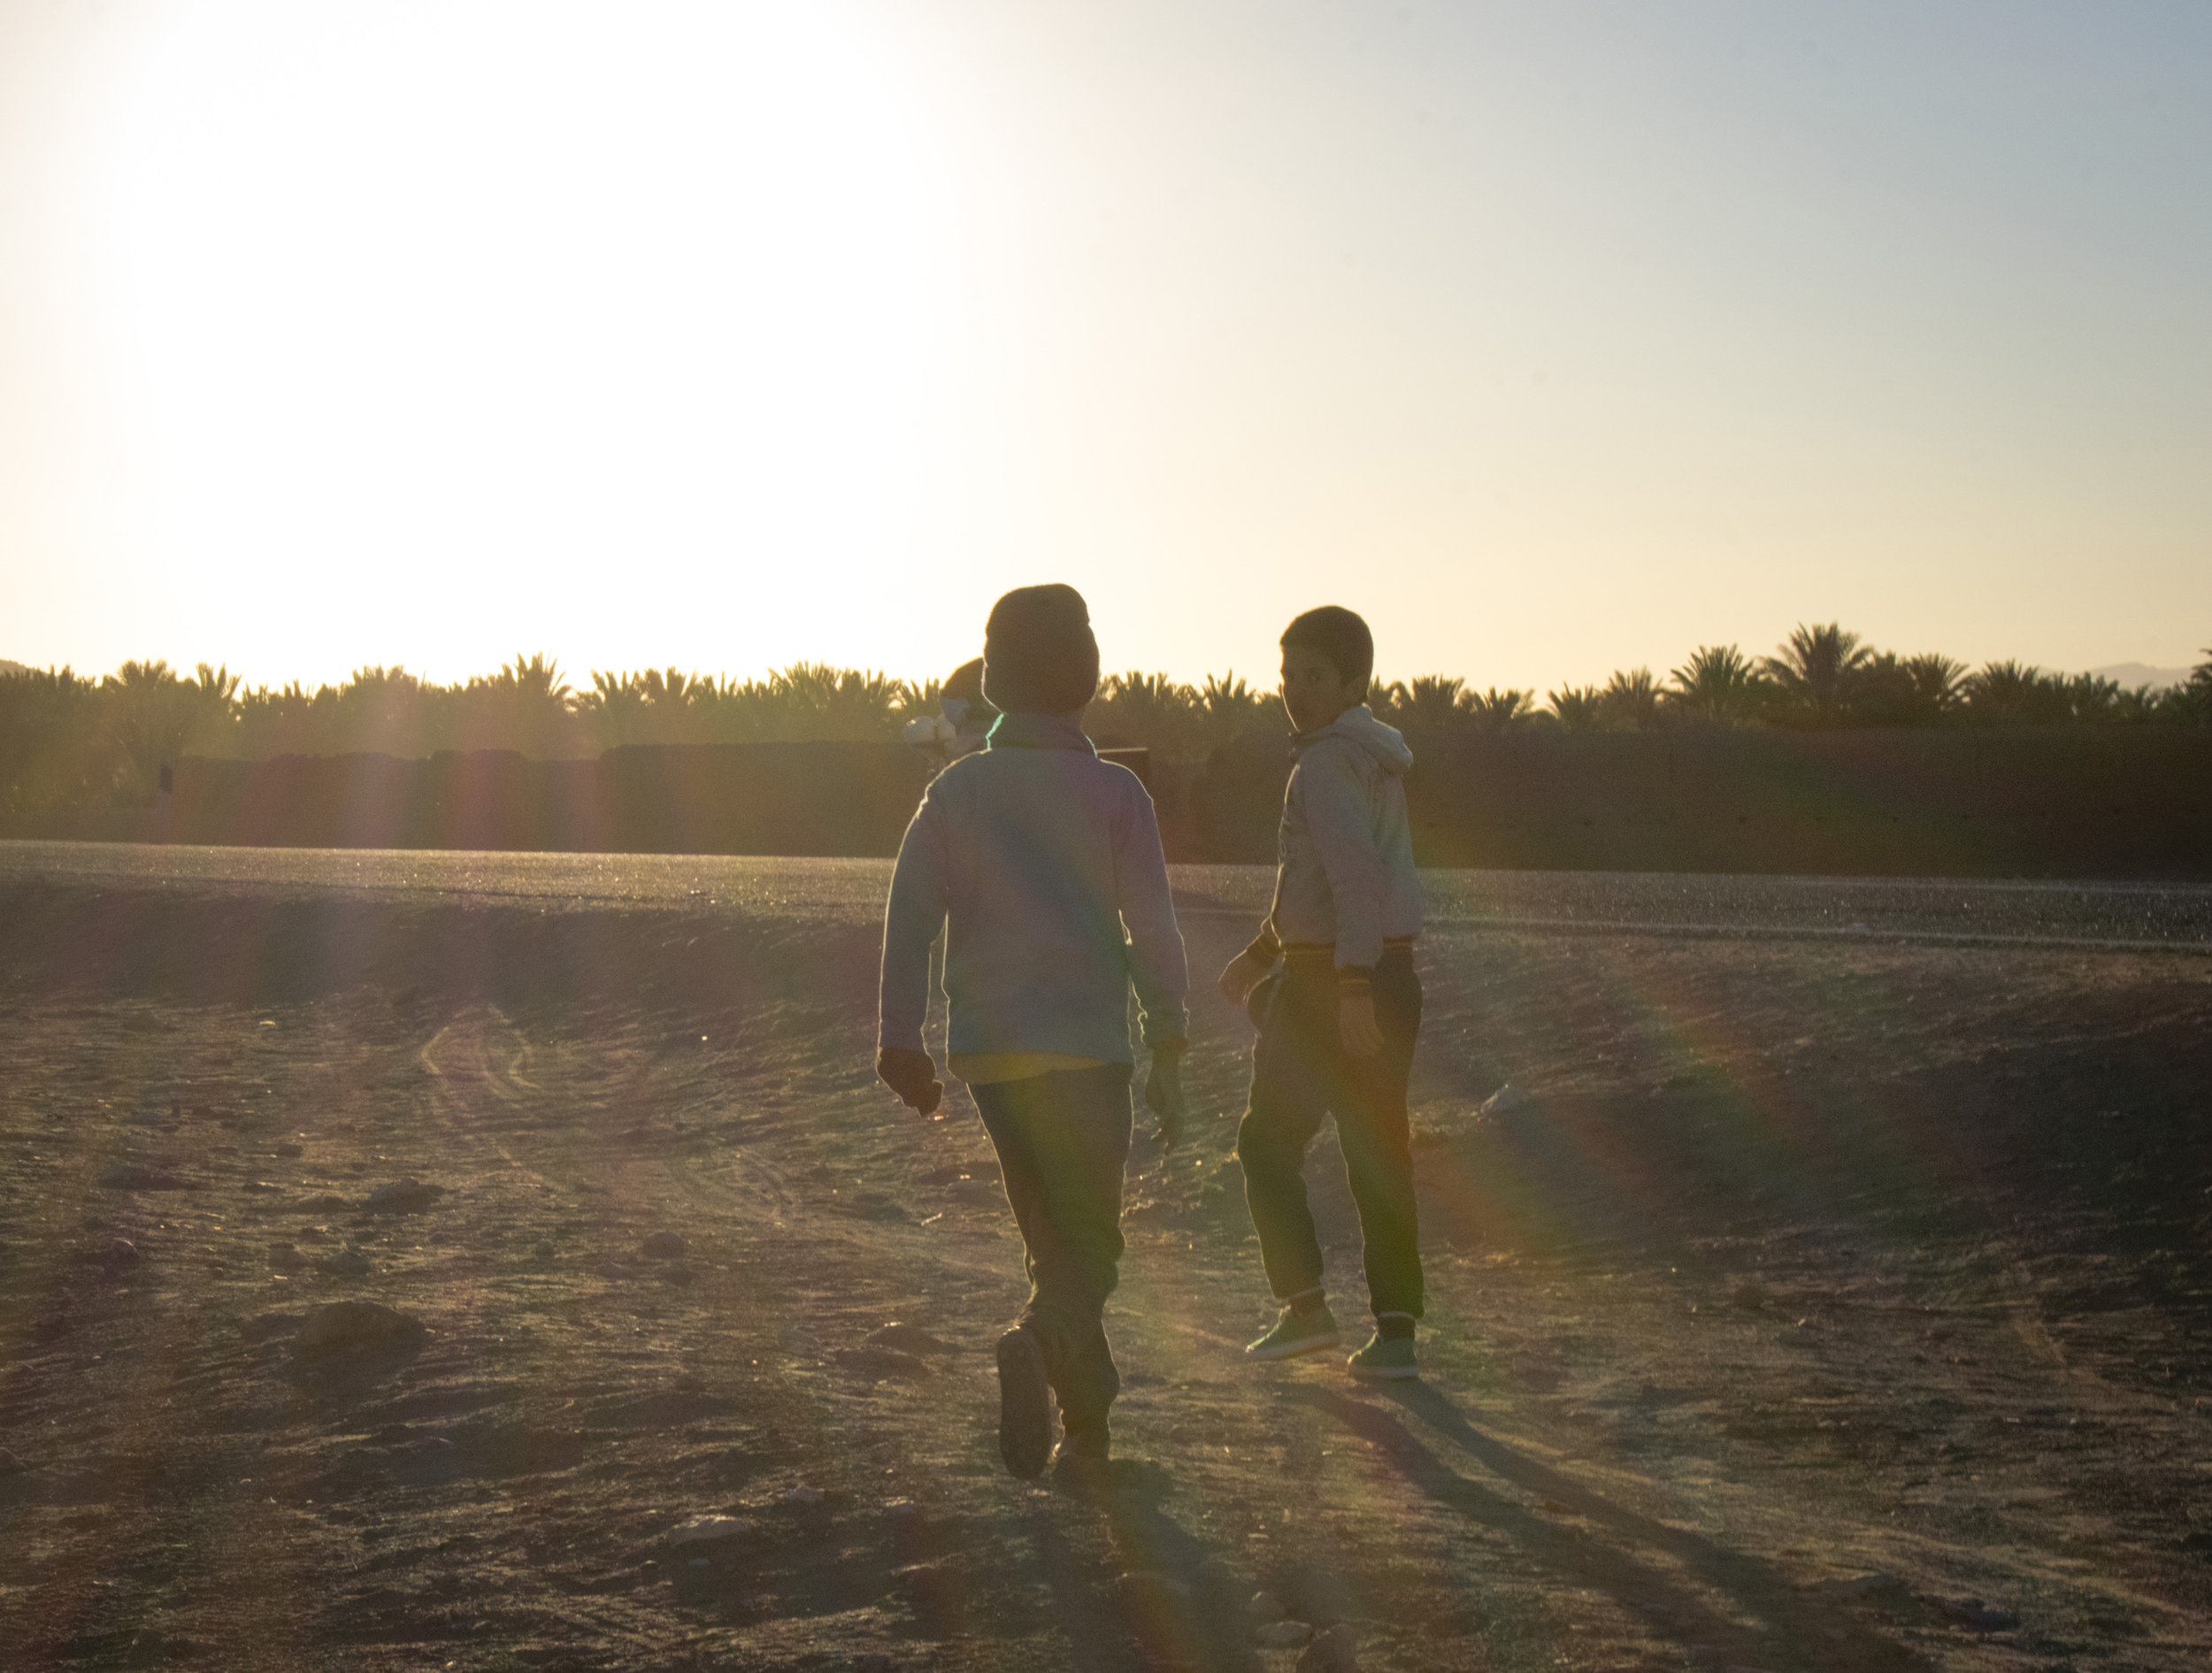 sahara_desert_boys.jpg